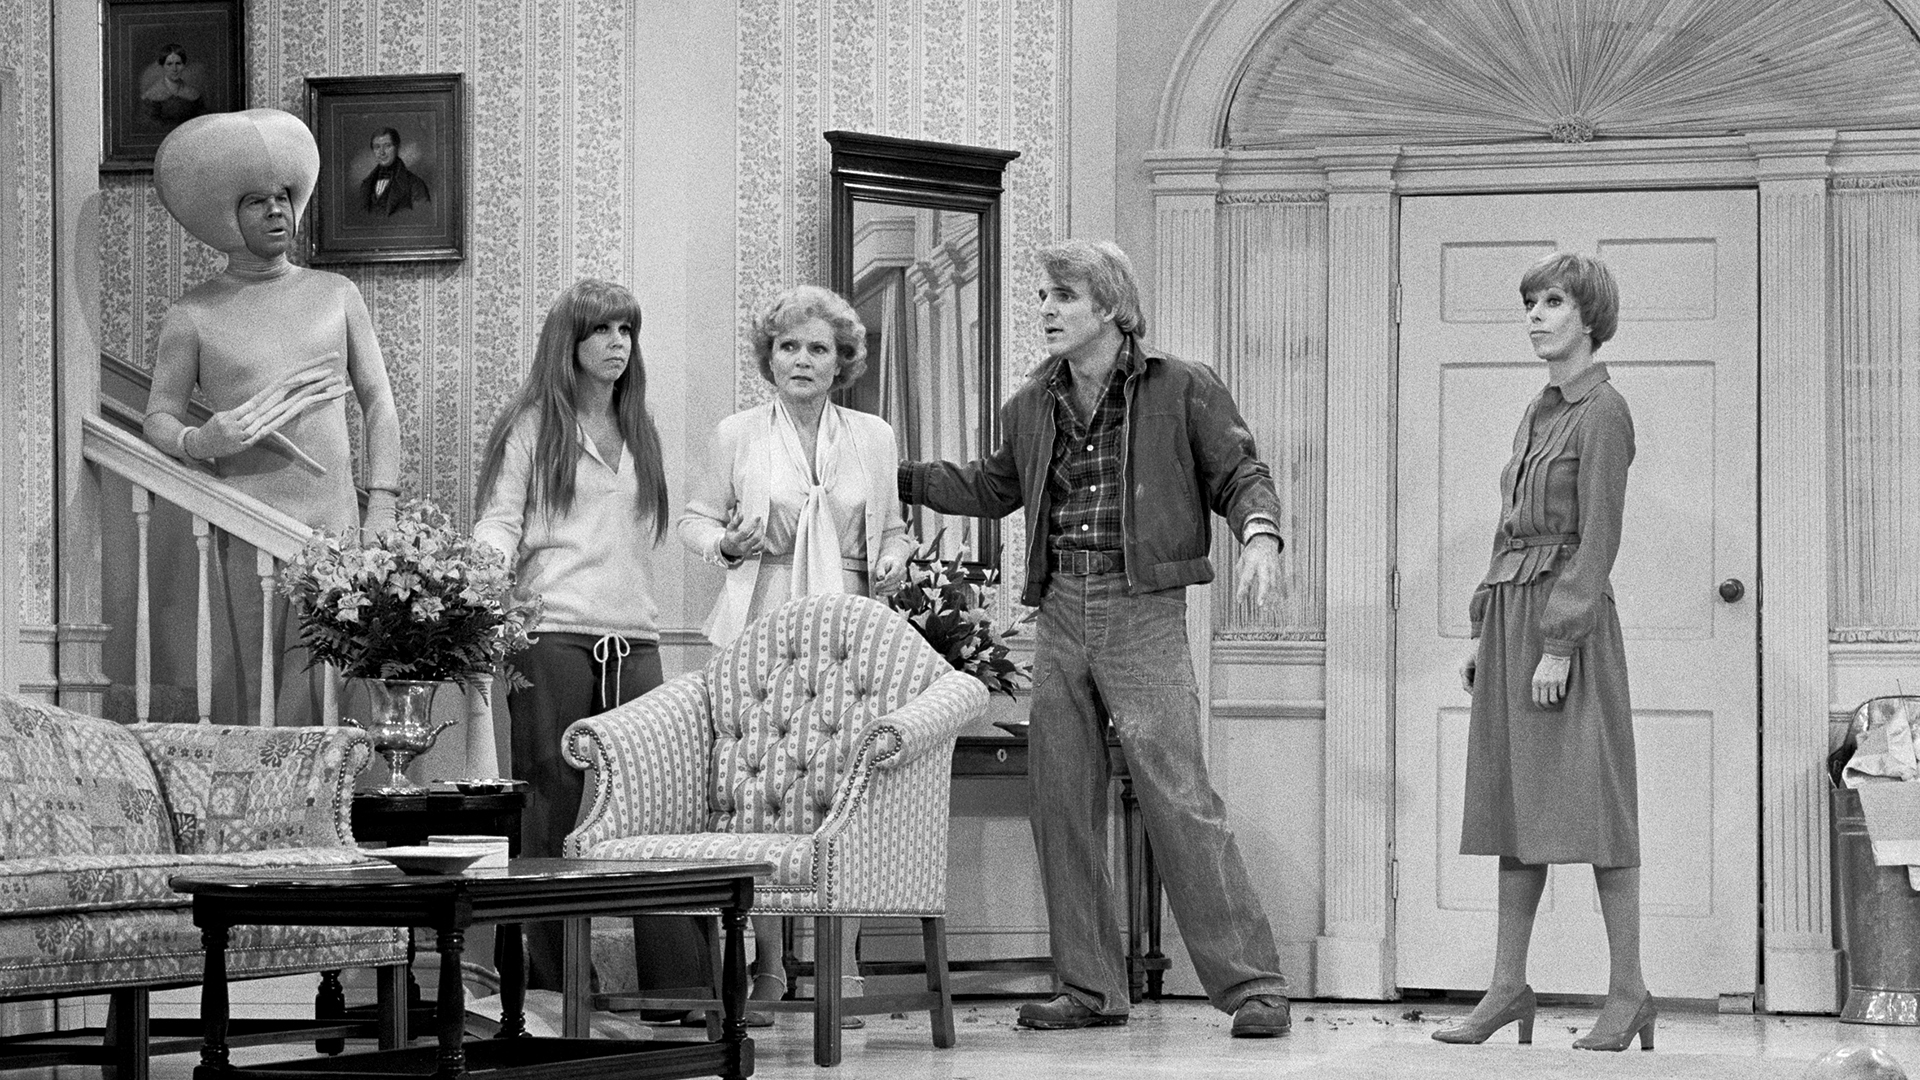 Carol Burnett with Steve Martin, Betty White, Vicki Lawrence, and Tim Conway.